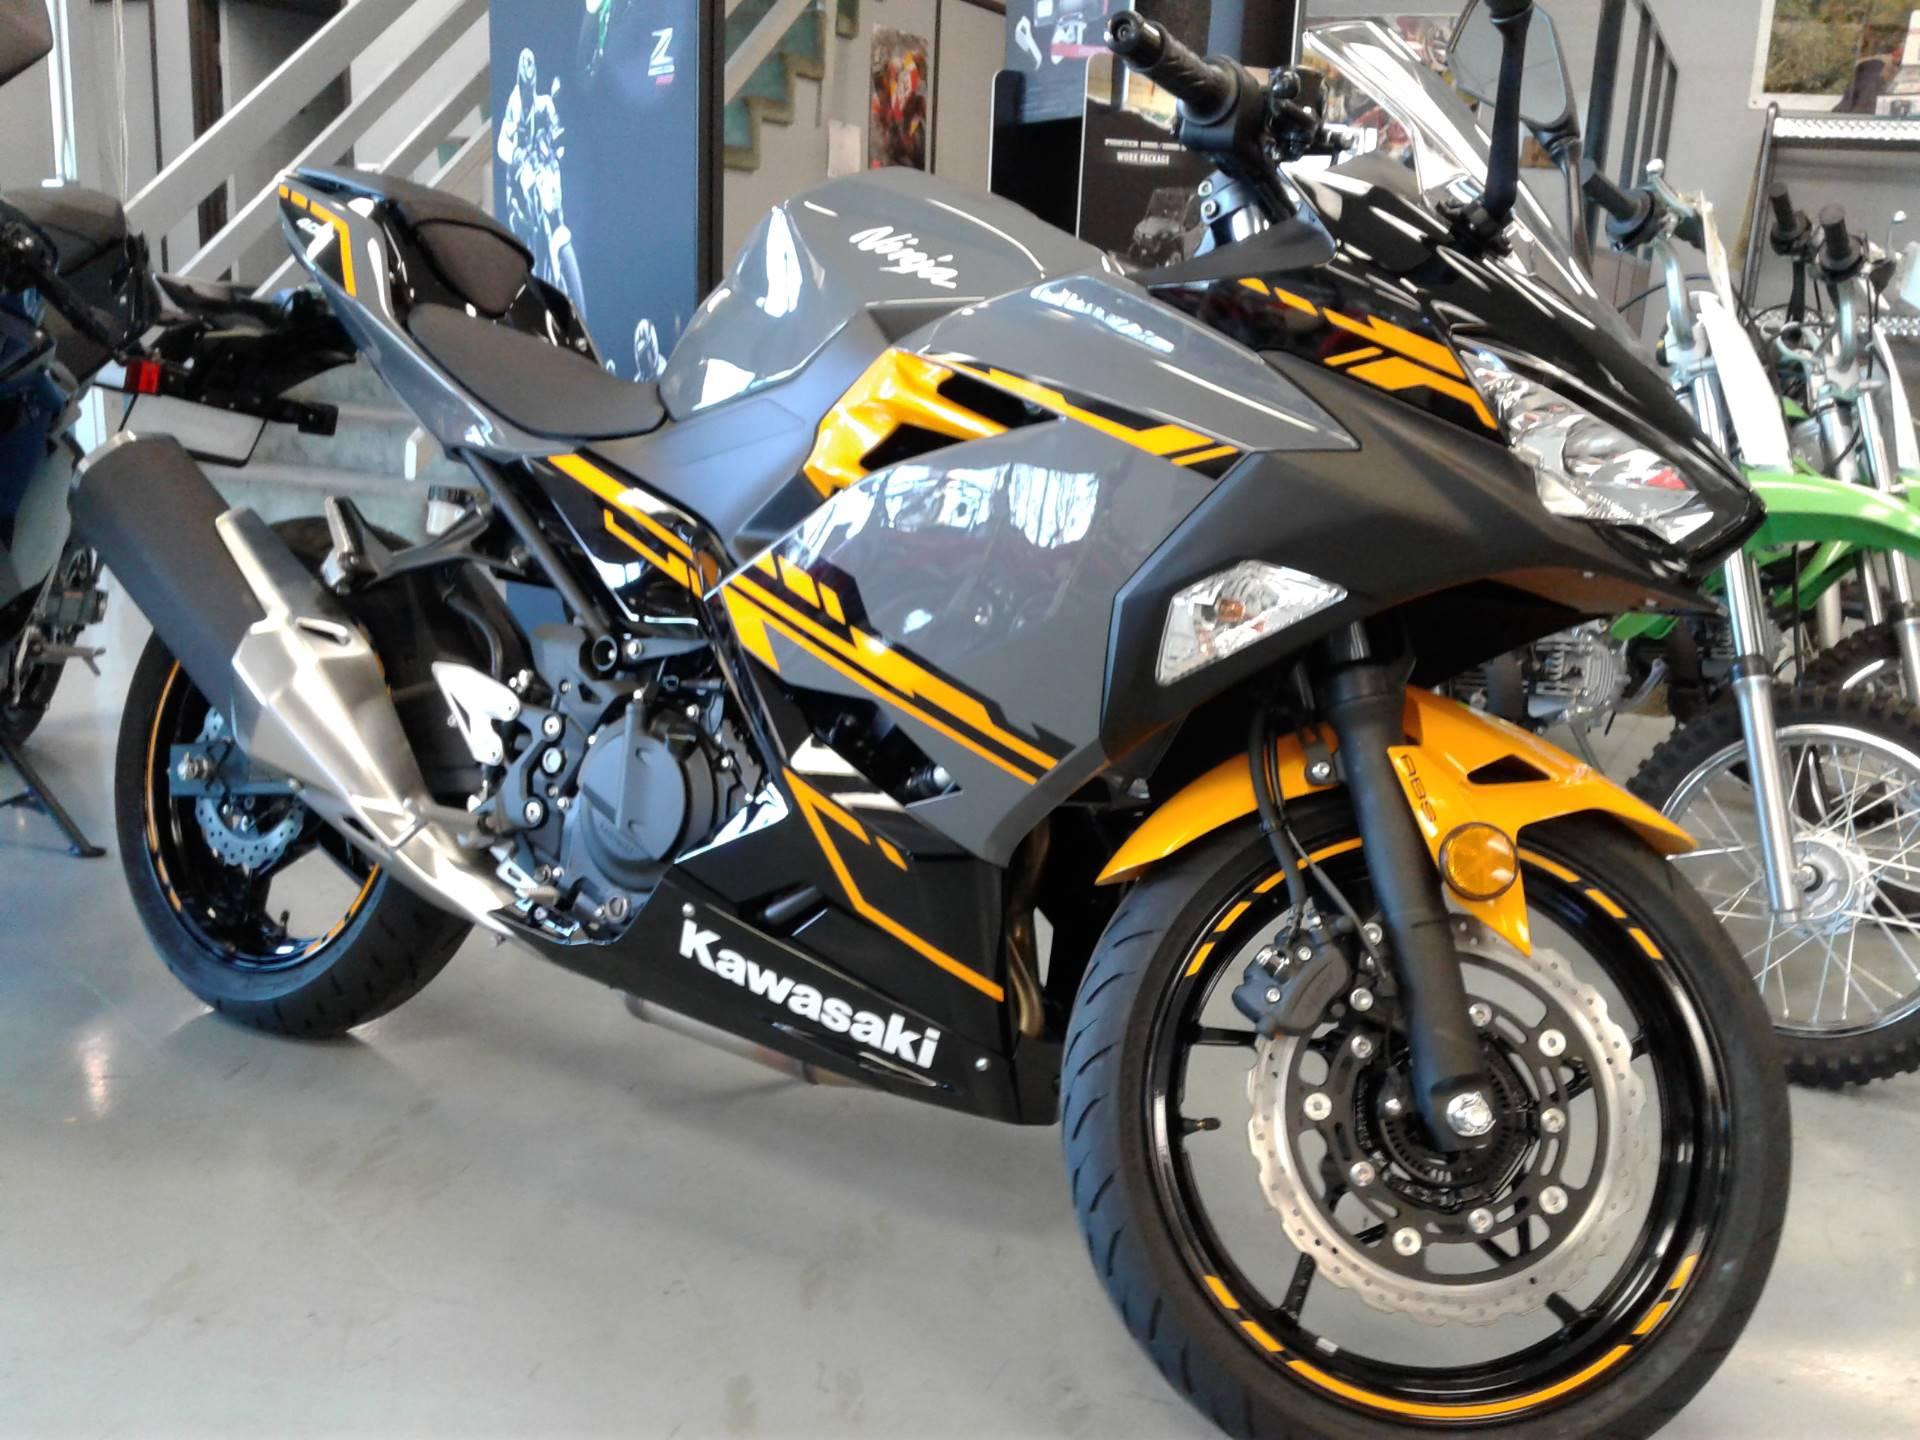 Honda Pre Owned >> New 2018 Kawasaki Ninja 400 ABS Motorcycles in Orange, CA | Stock Number: 12064M